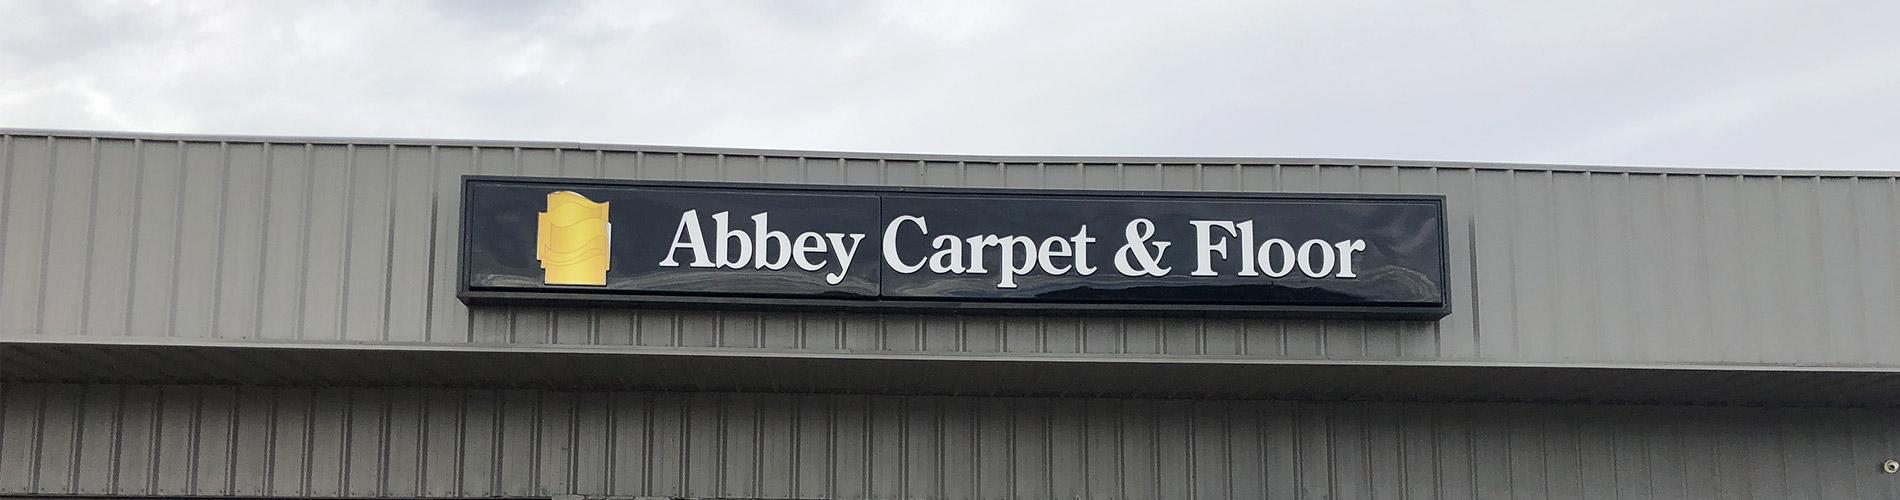 Abbey Carpet & Floor in Bentonville, Arkansas